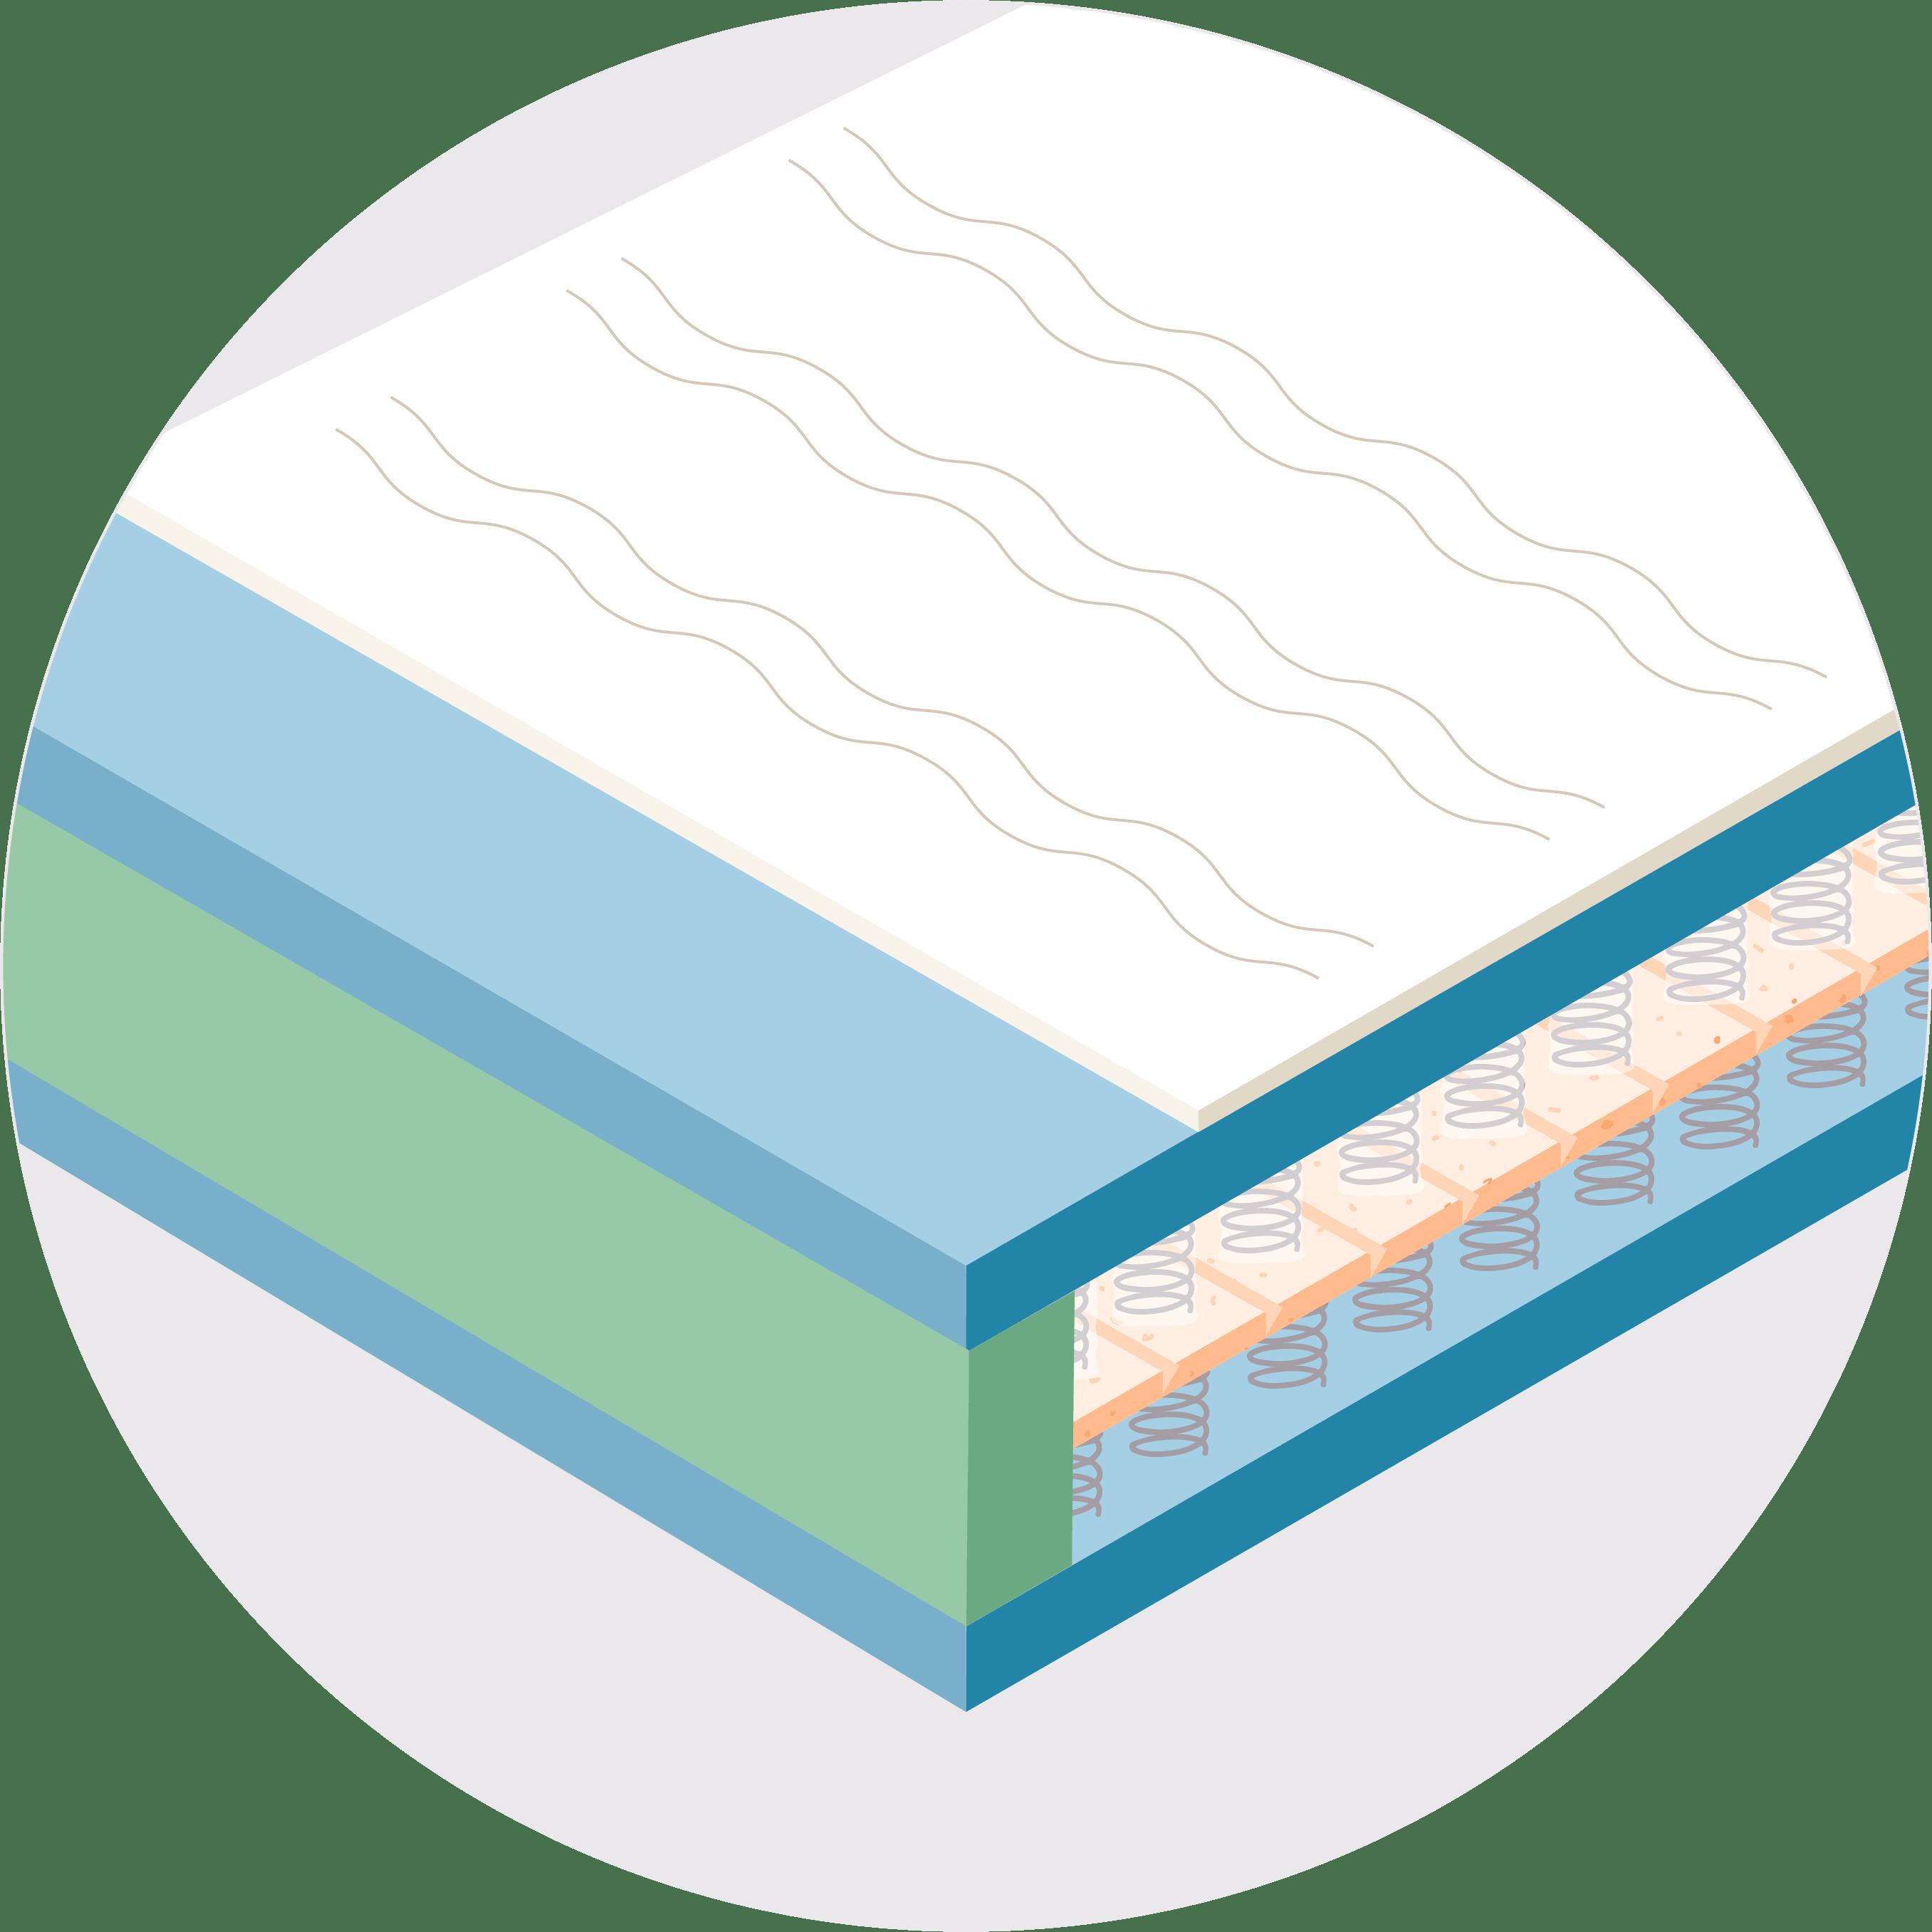 Matratzenratgeber Navigation Viscoschaum-Matratzen